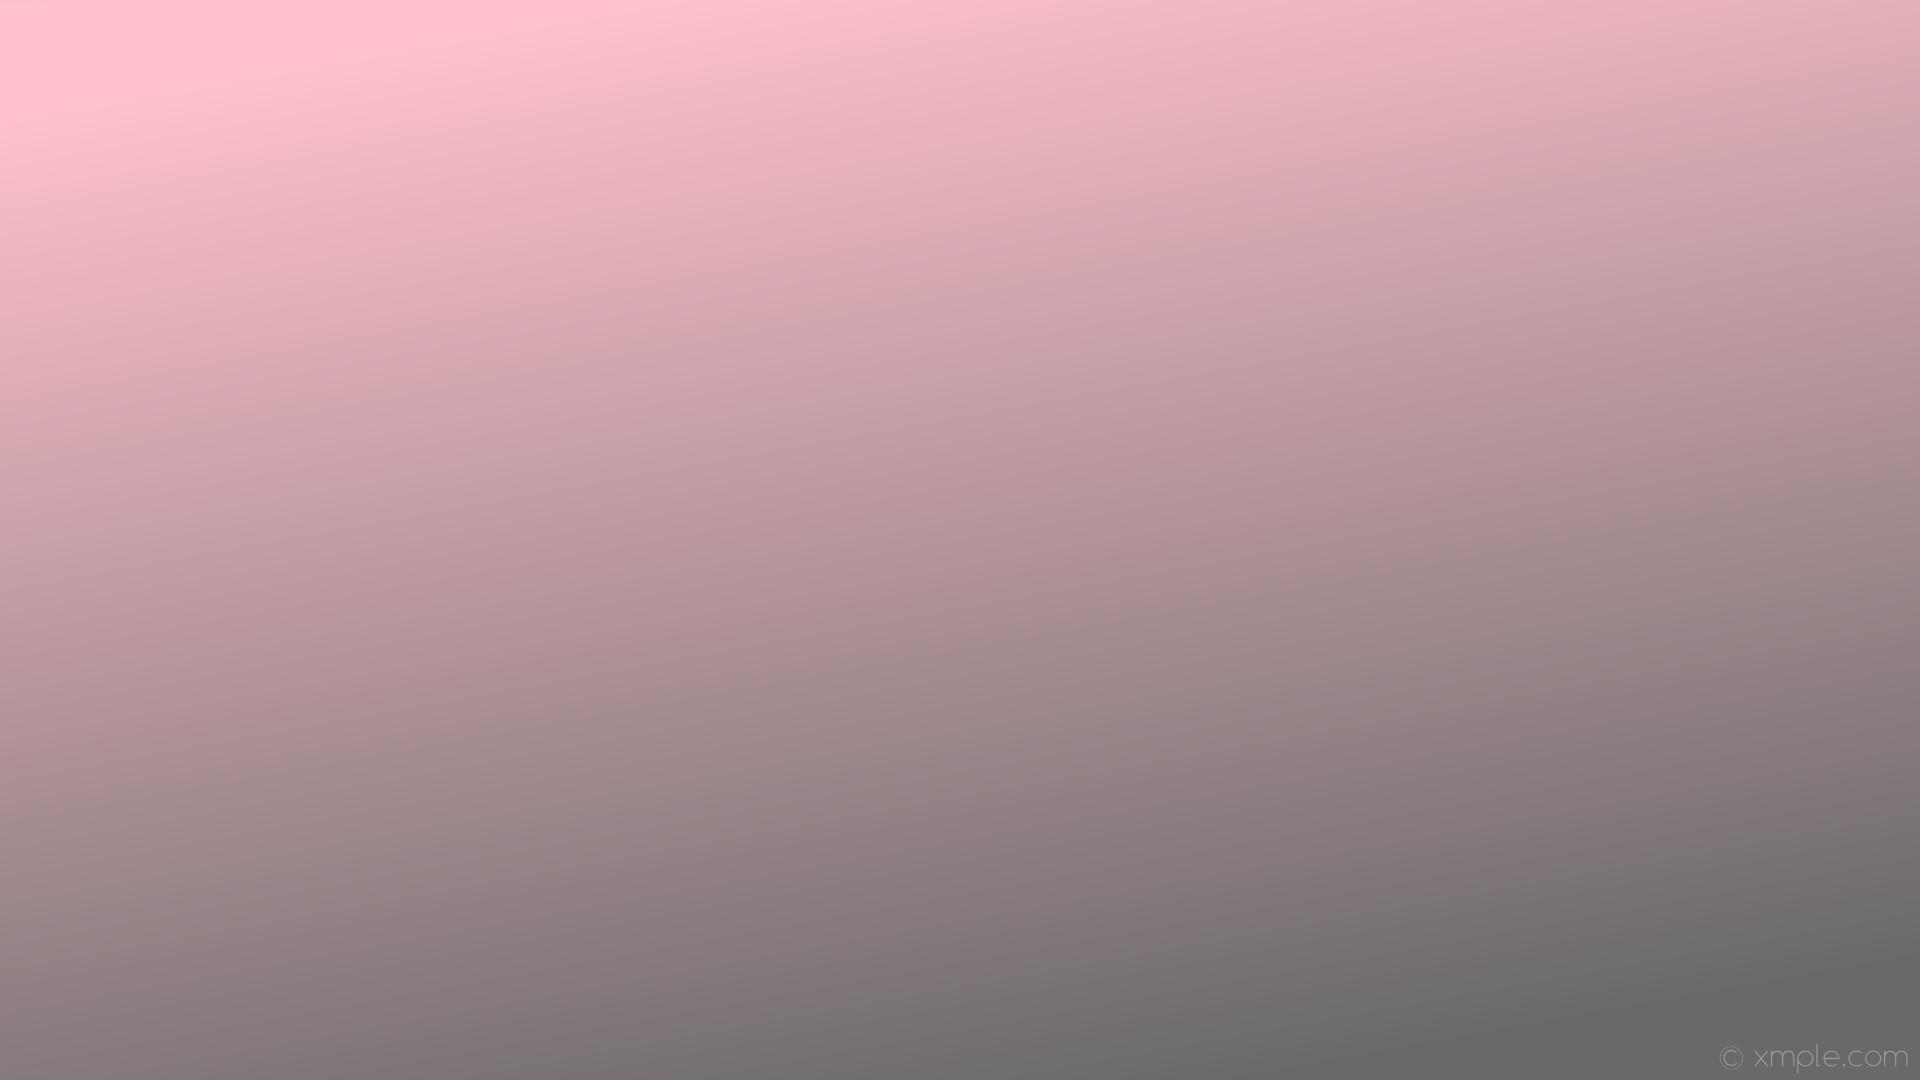 wallpaper grey pink linear gradient dim gray #ffc0cb #696969 120°